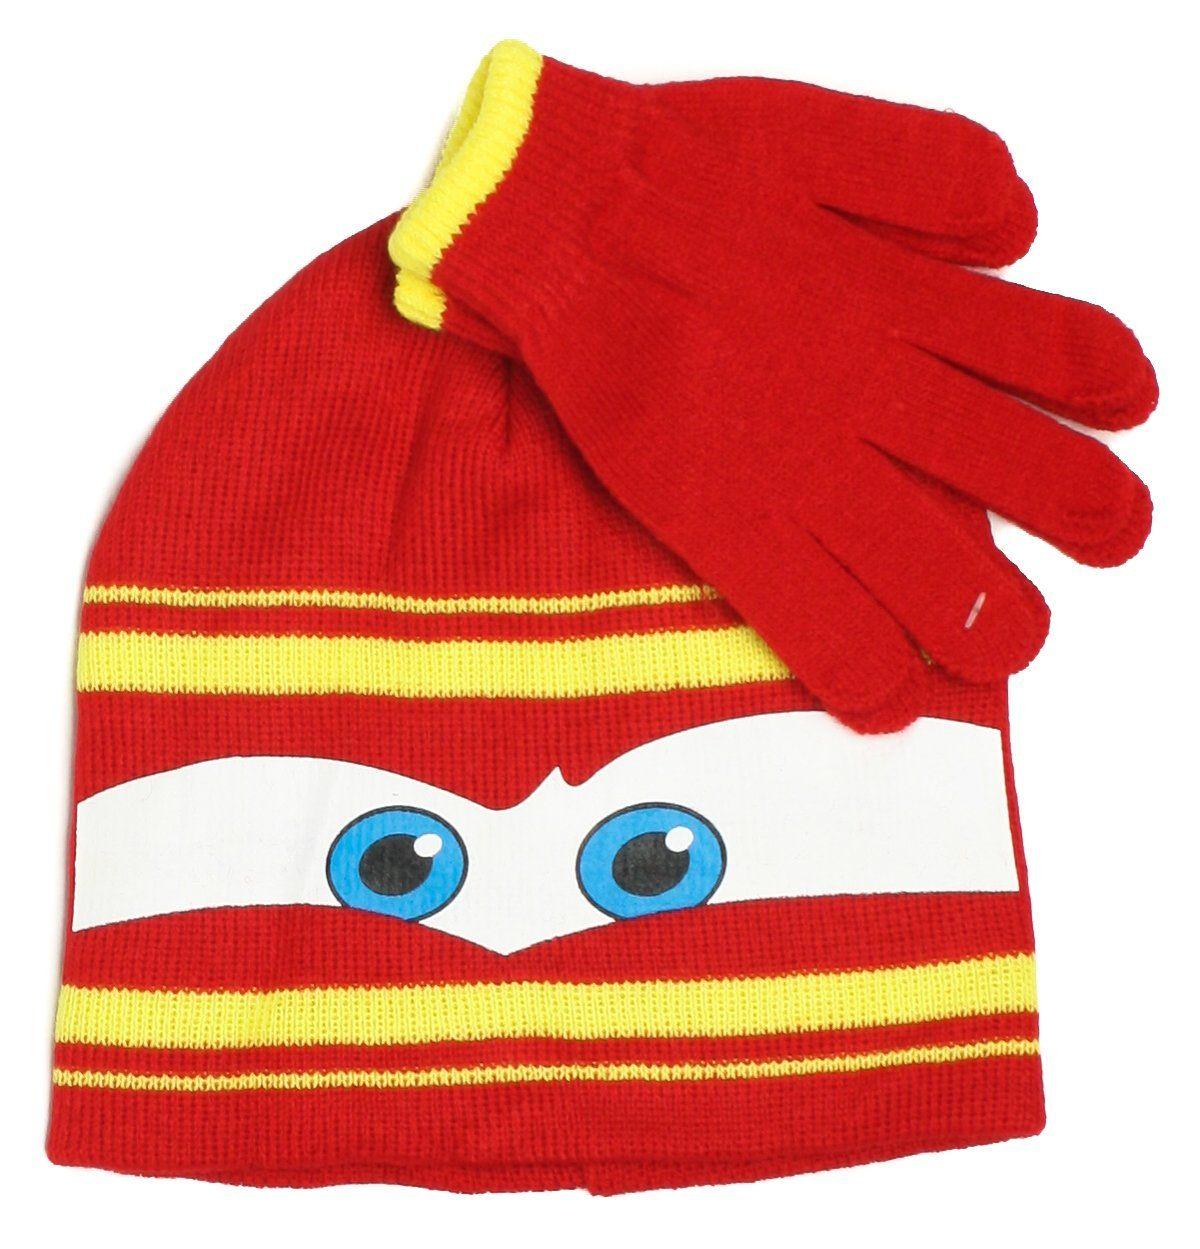 28cec34c161 Disney Pixar Lightning McQueen Cars Winter Beanie Hat and Gloves Set ...